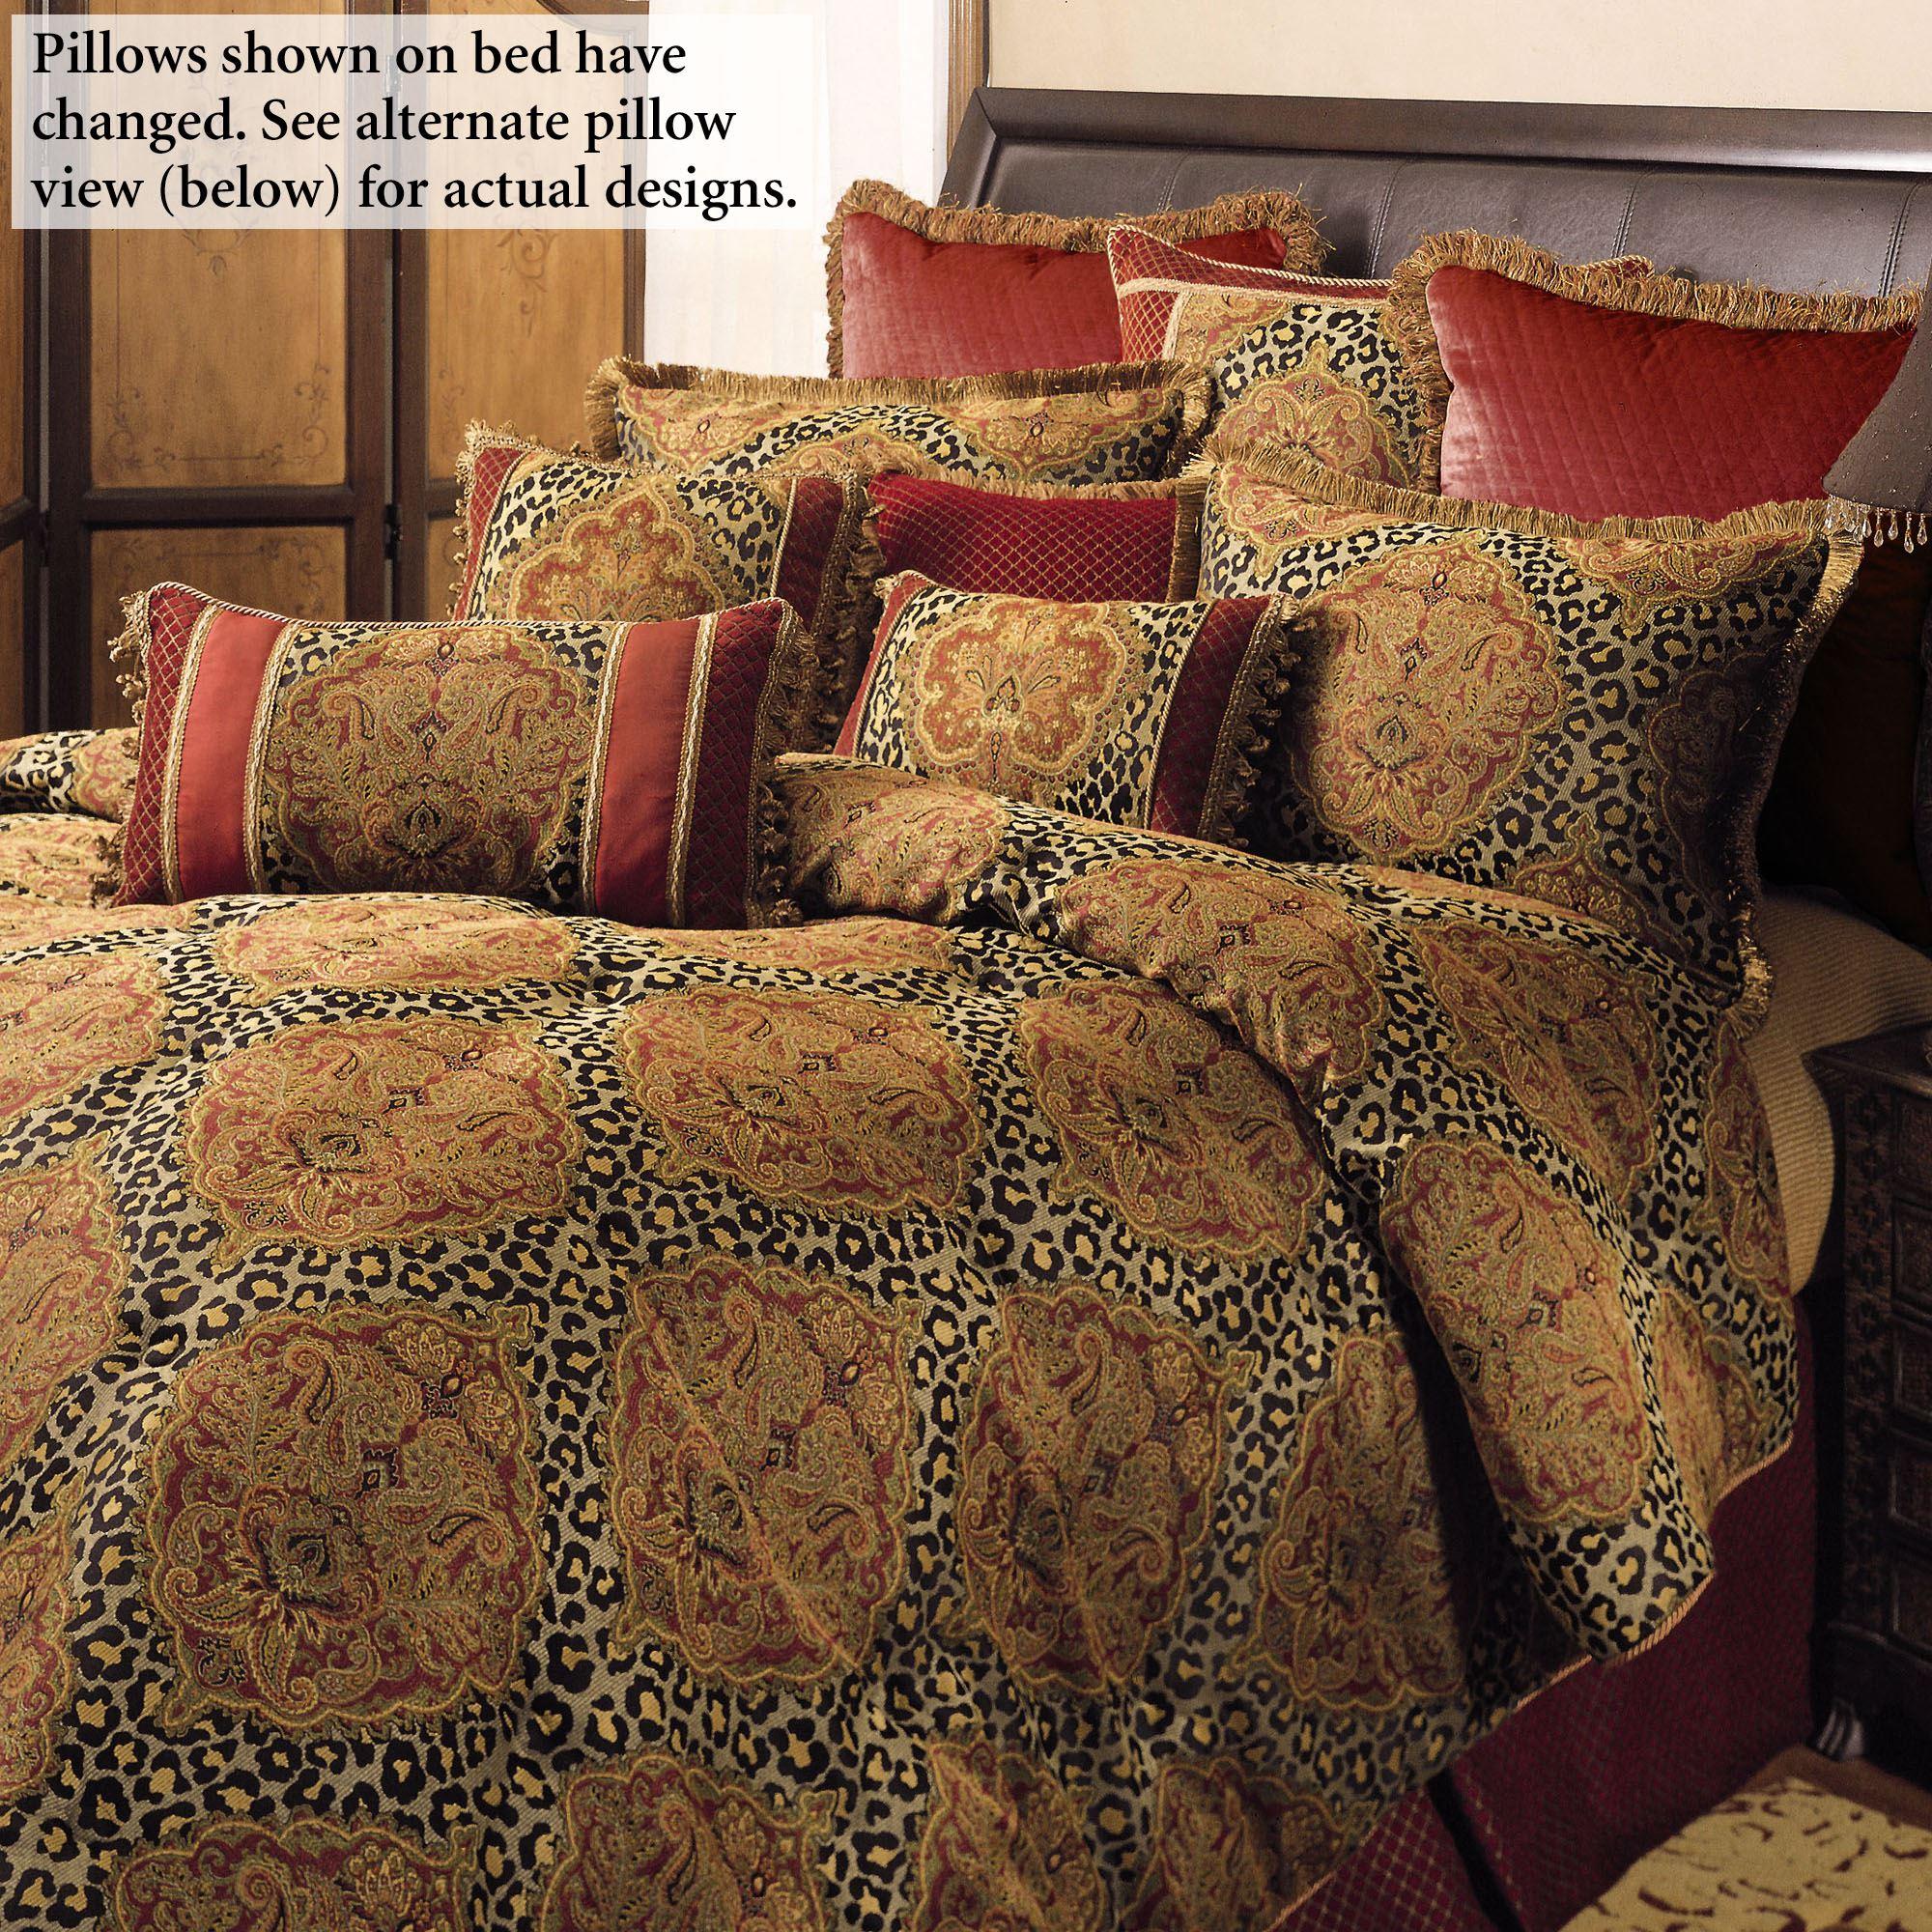 Leopard Print Wallpaper For Bedroom Images Crazy Gallery 2000x2000